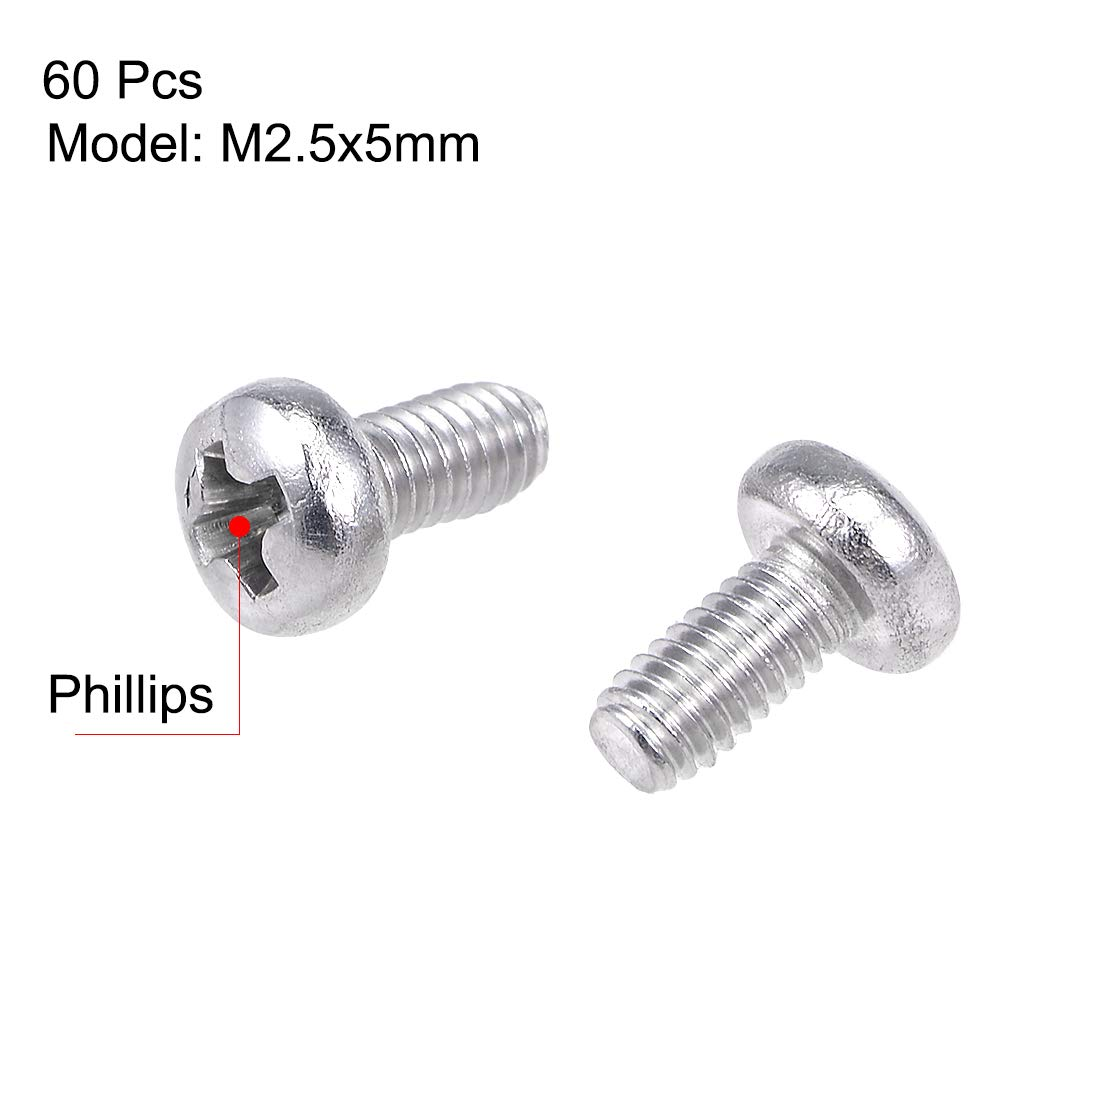 uxcell M2.5x5mm Machine Screws Pan Phillips Cross Head Screw 304 Stainless Steel Fasteners Bolts 100Pcs